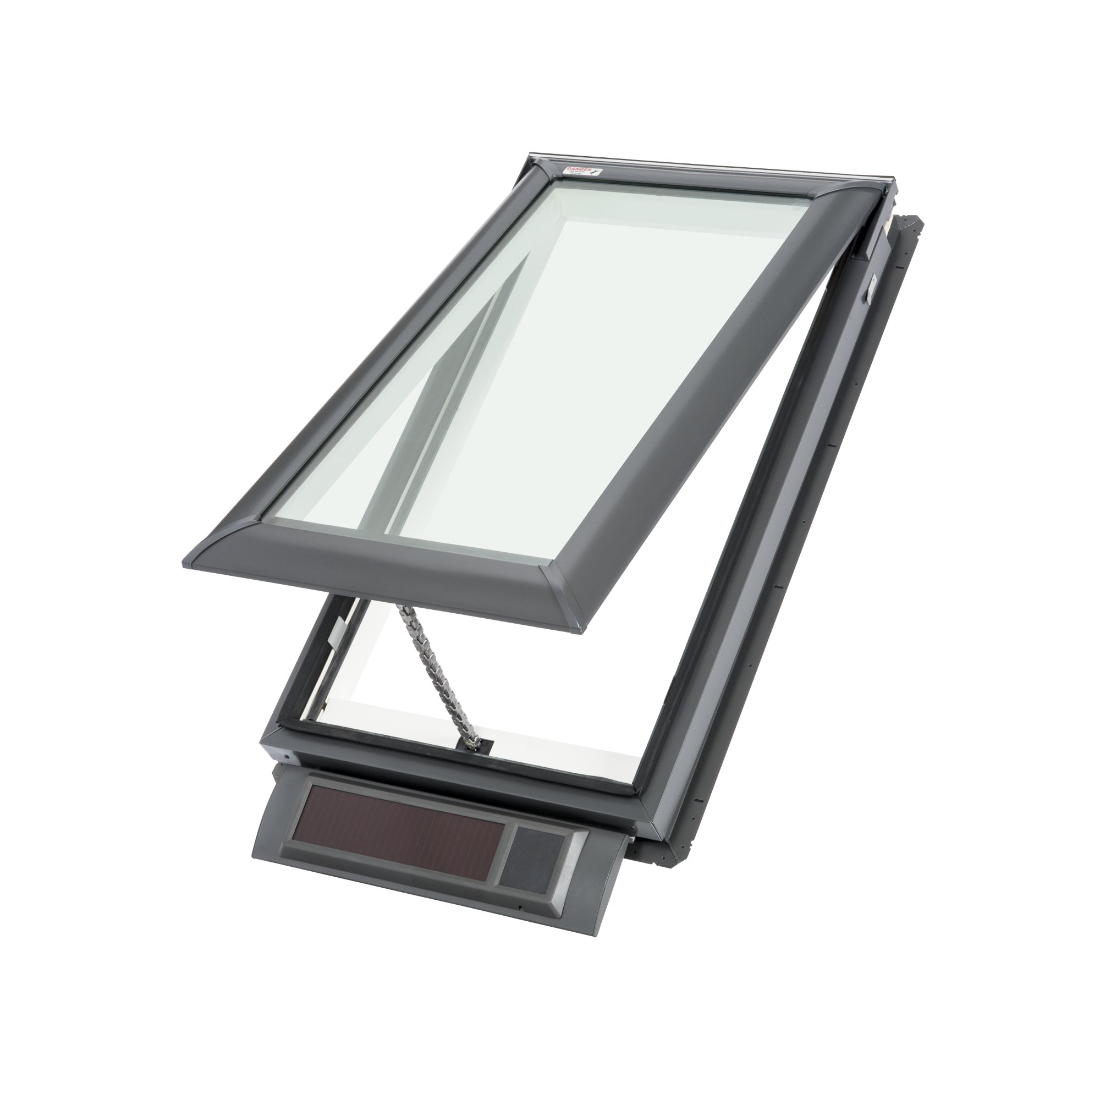 Solar Powered Skylight 550 x 1400mm